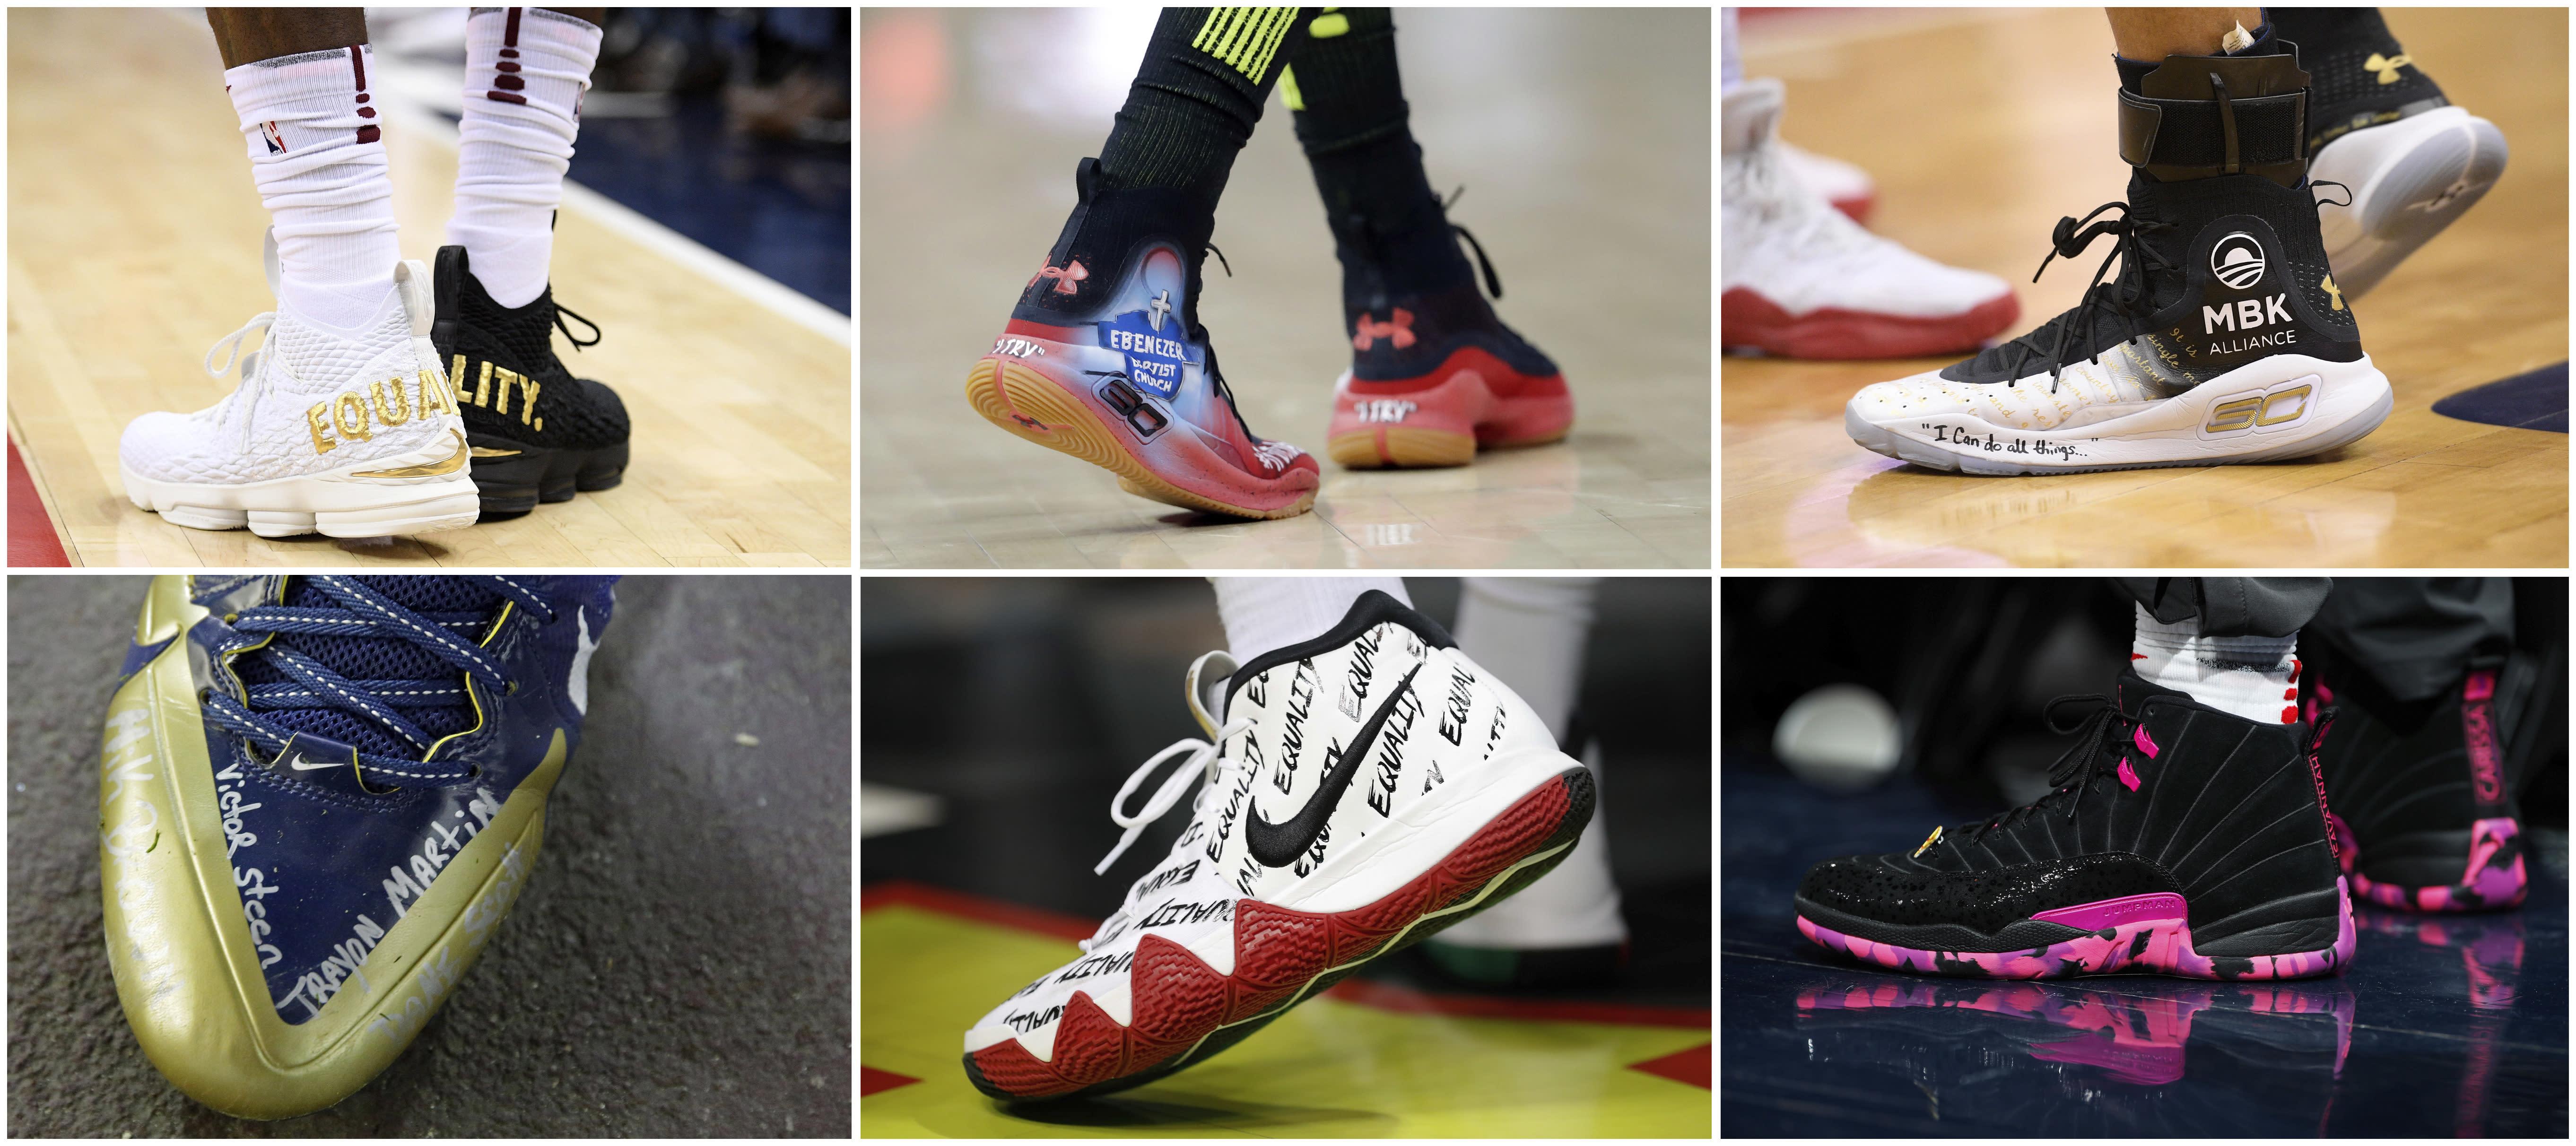 082f01ad1 Nike s Kaepernick campaign signals change in shoe politics